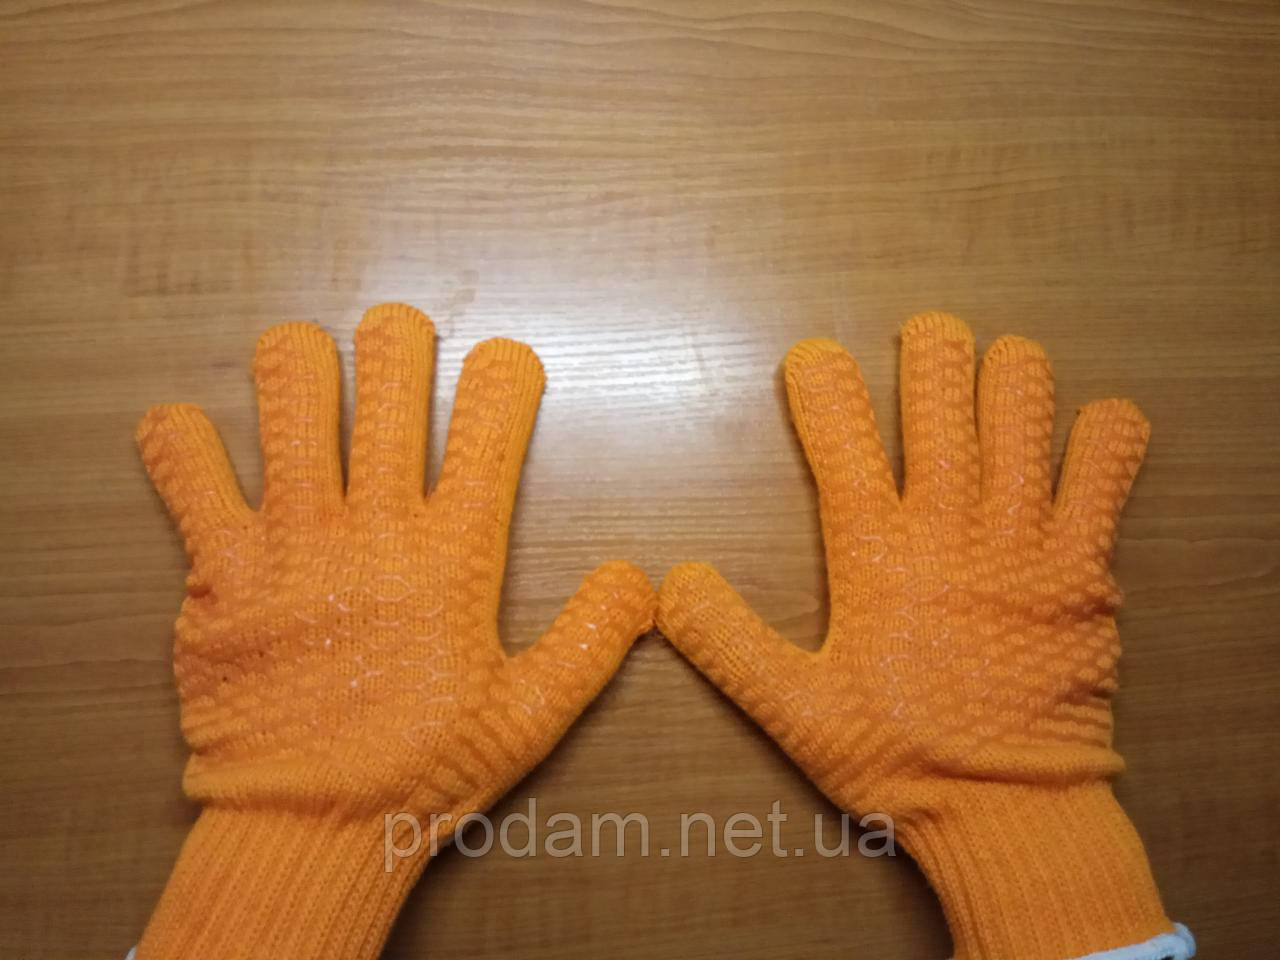 Робочие перчатки Reis rcross